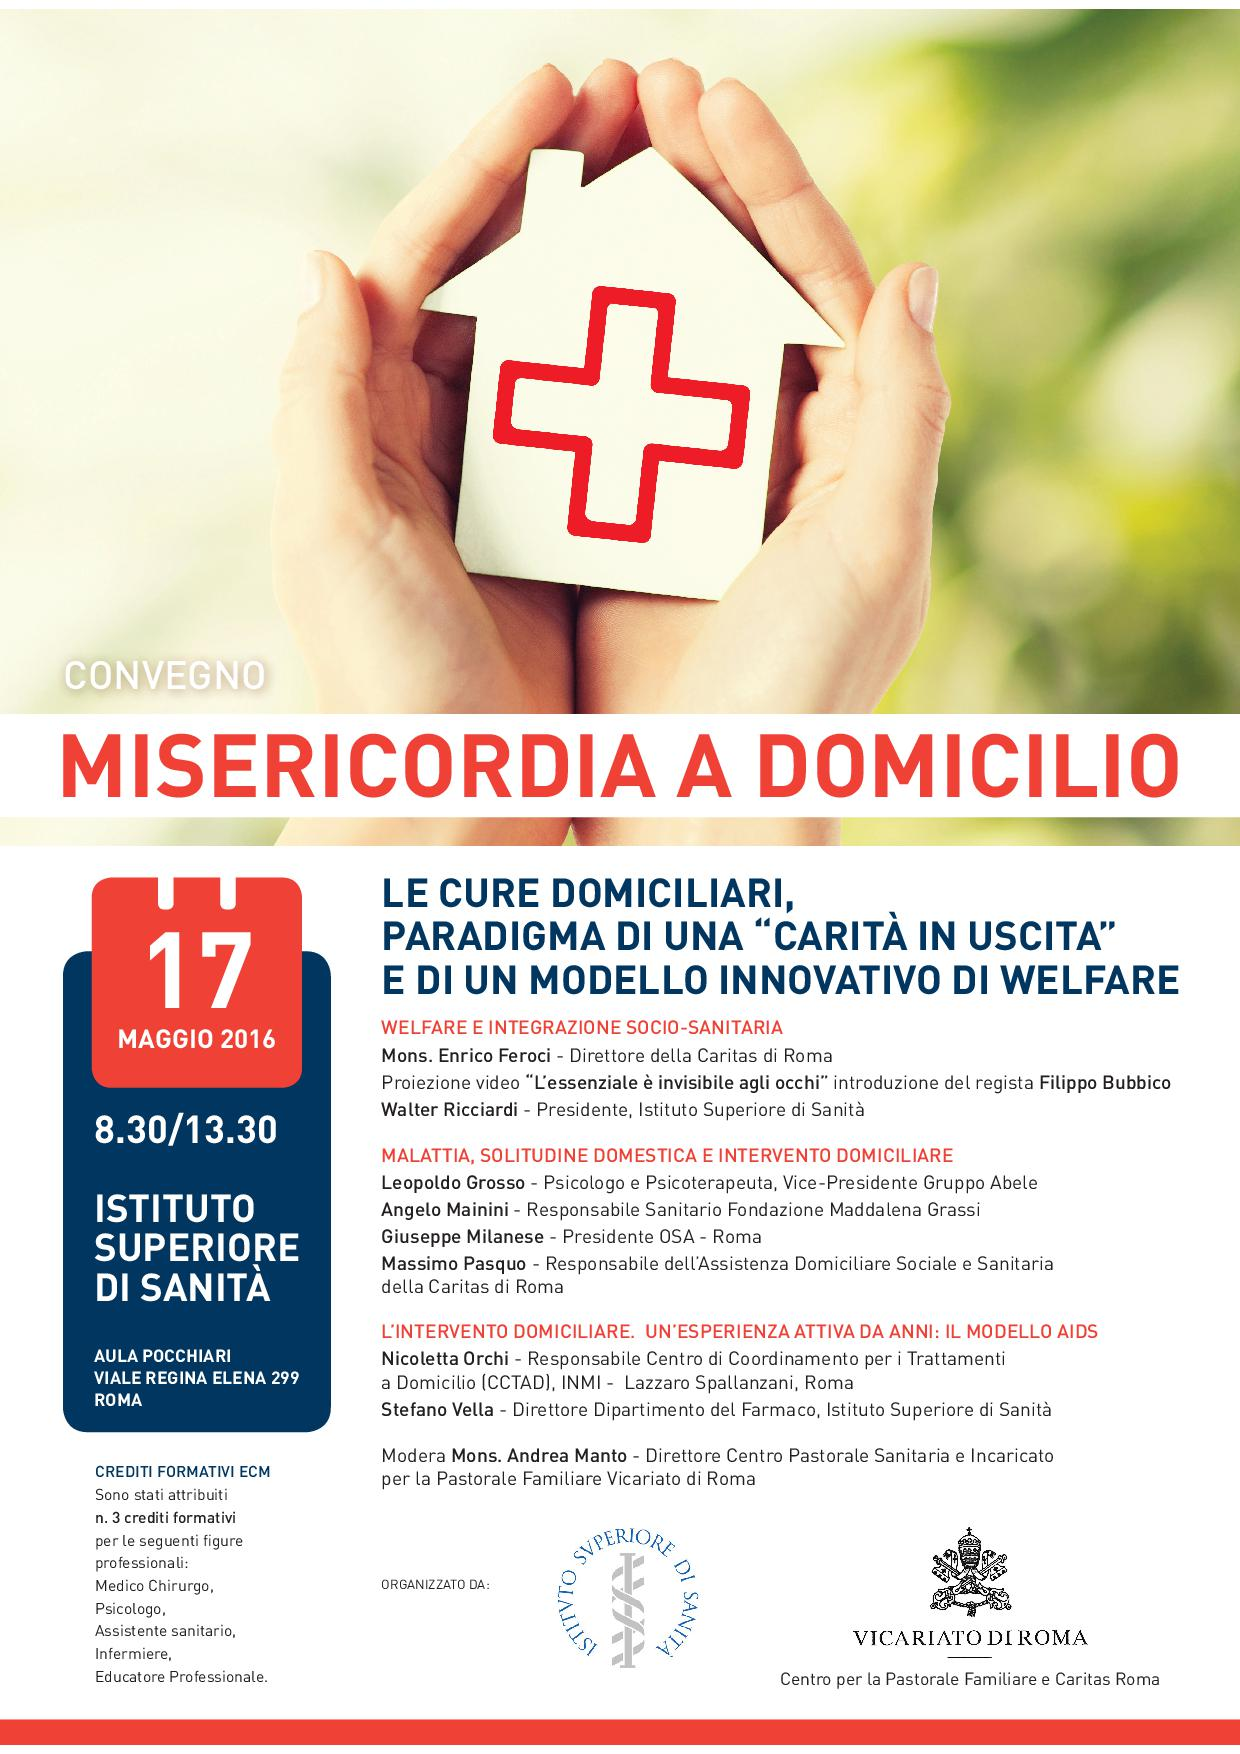 MisericordiaDomicilio